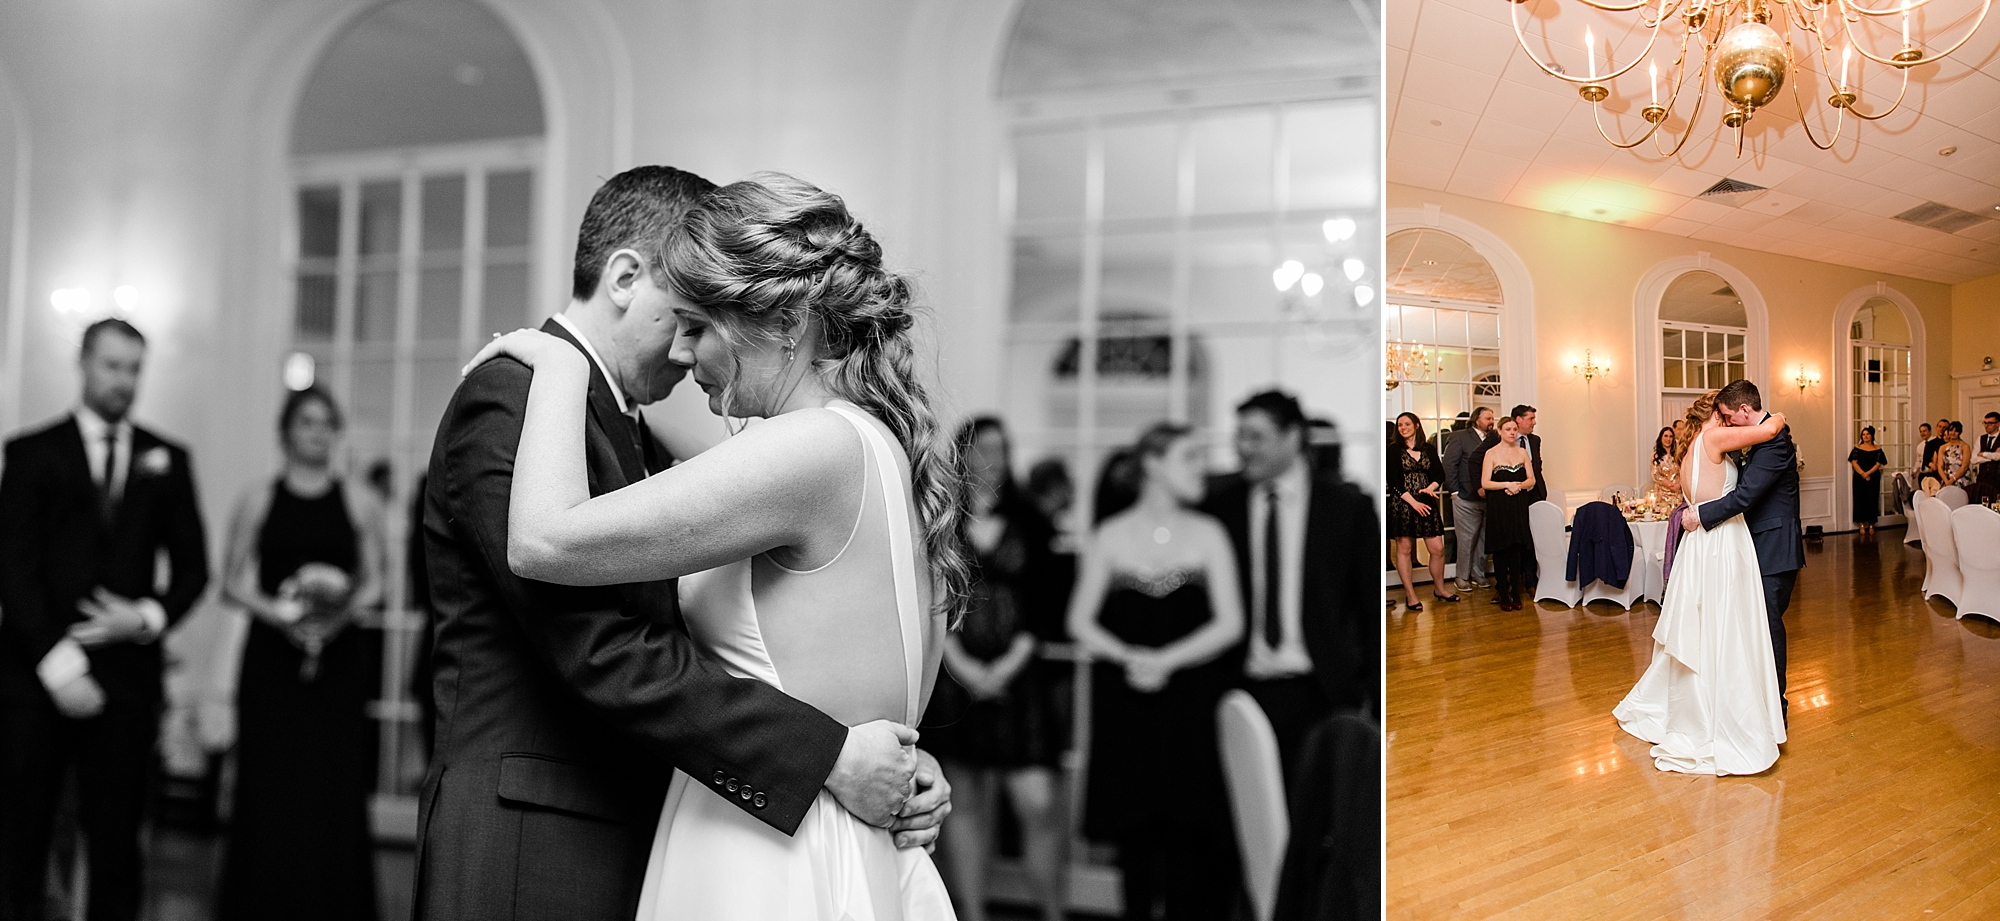 eisleyimages-irish-wedding-boston-seaport_0095.jpg